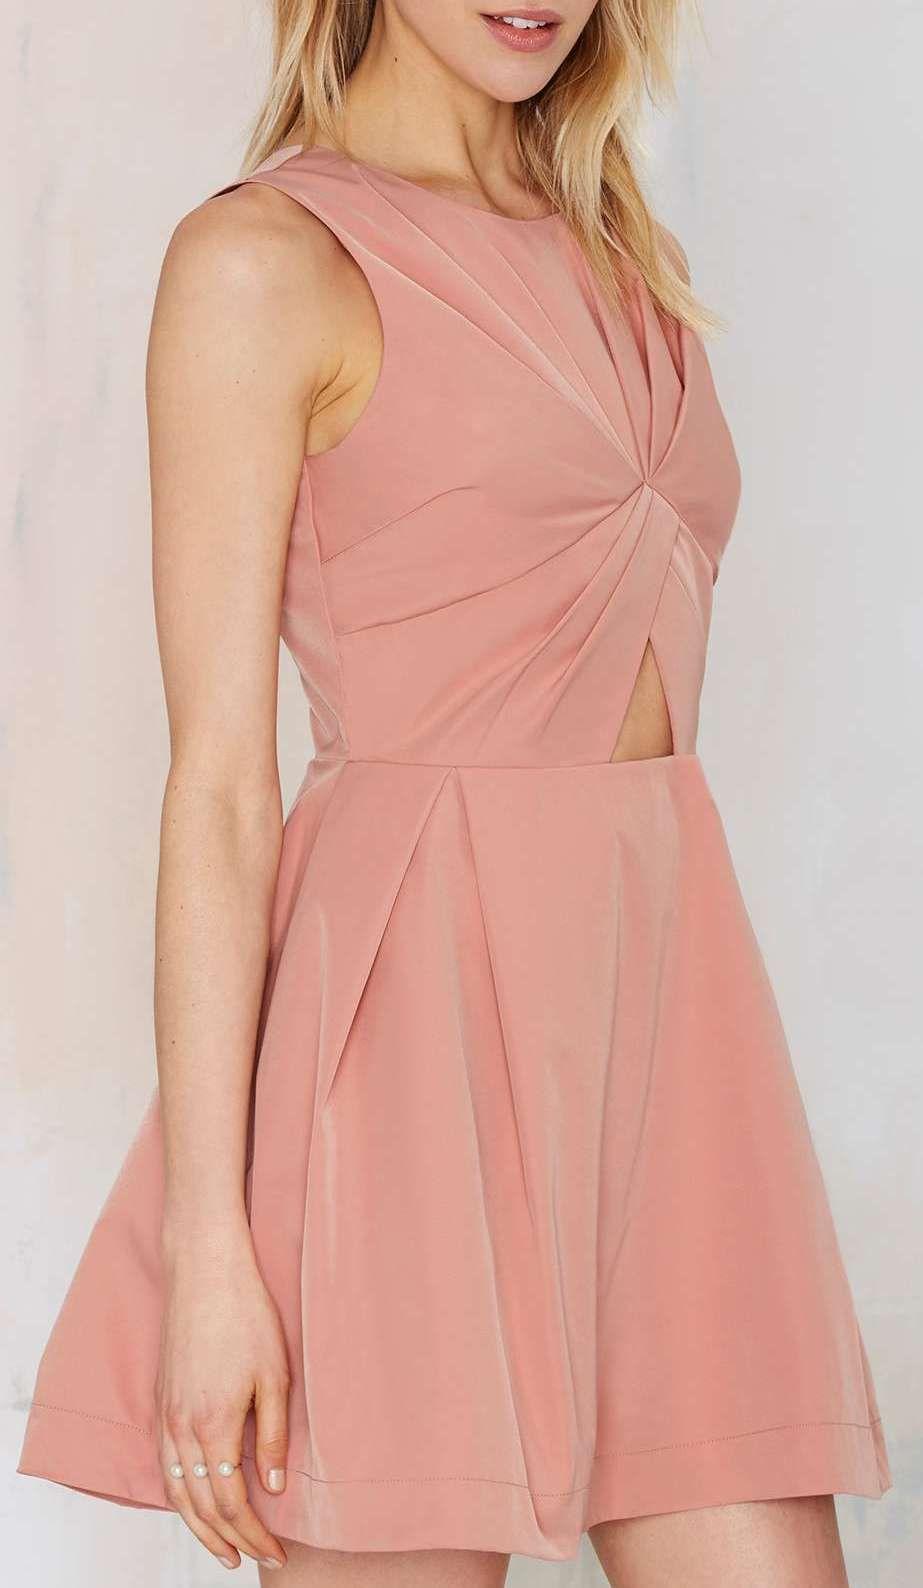 Knot in Love Cutout Dress